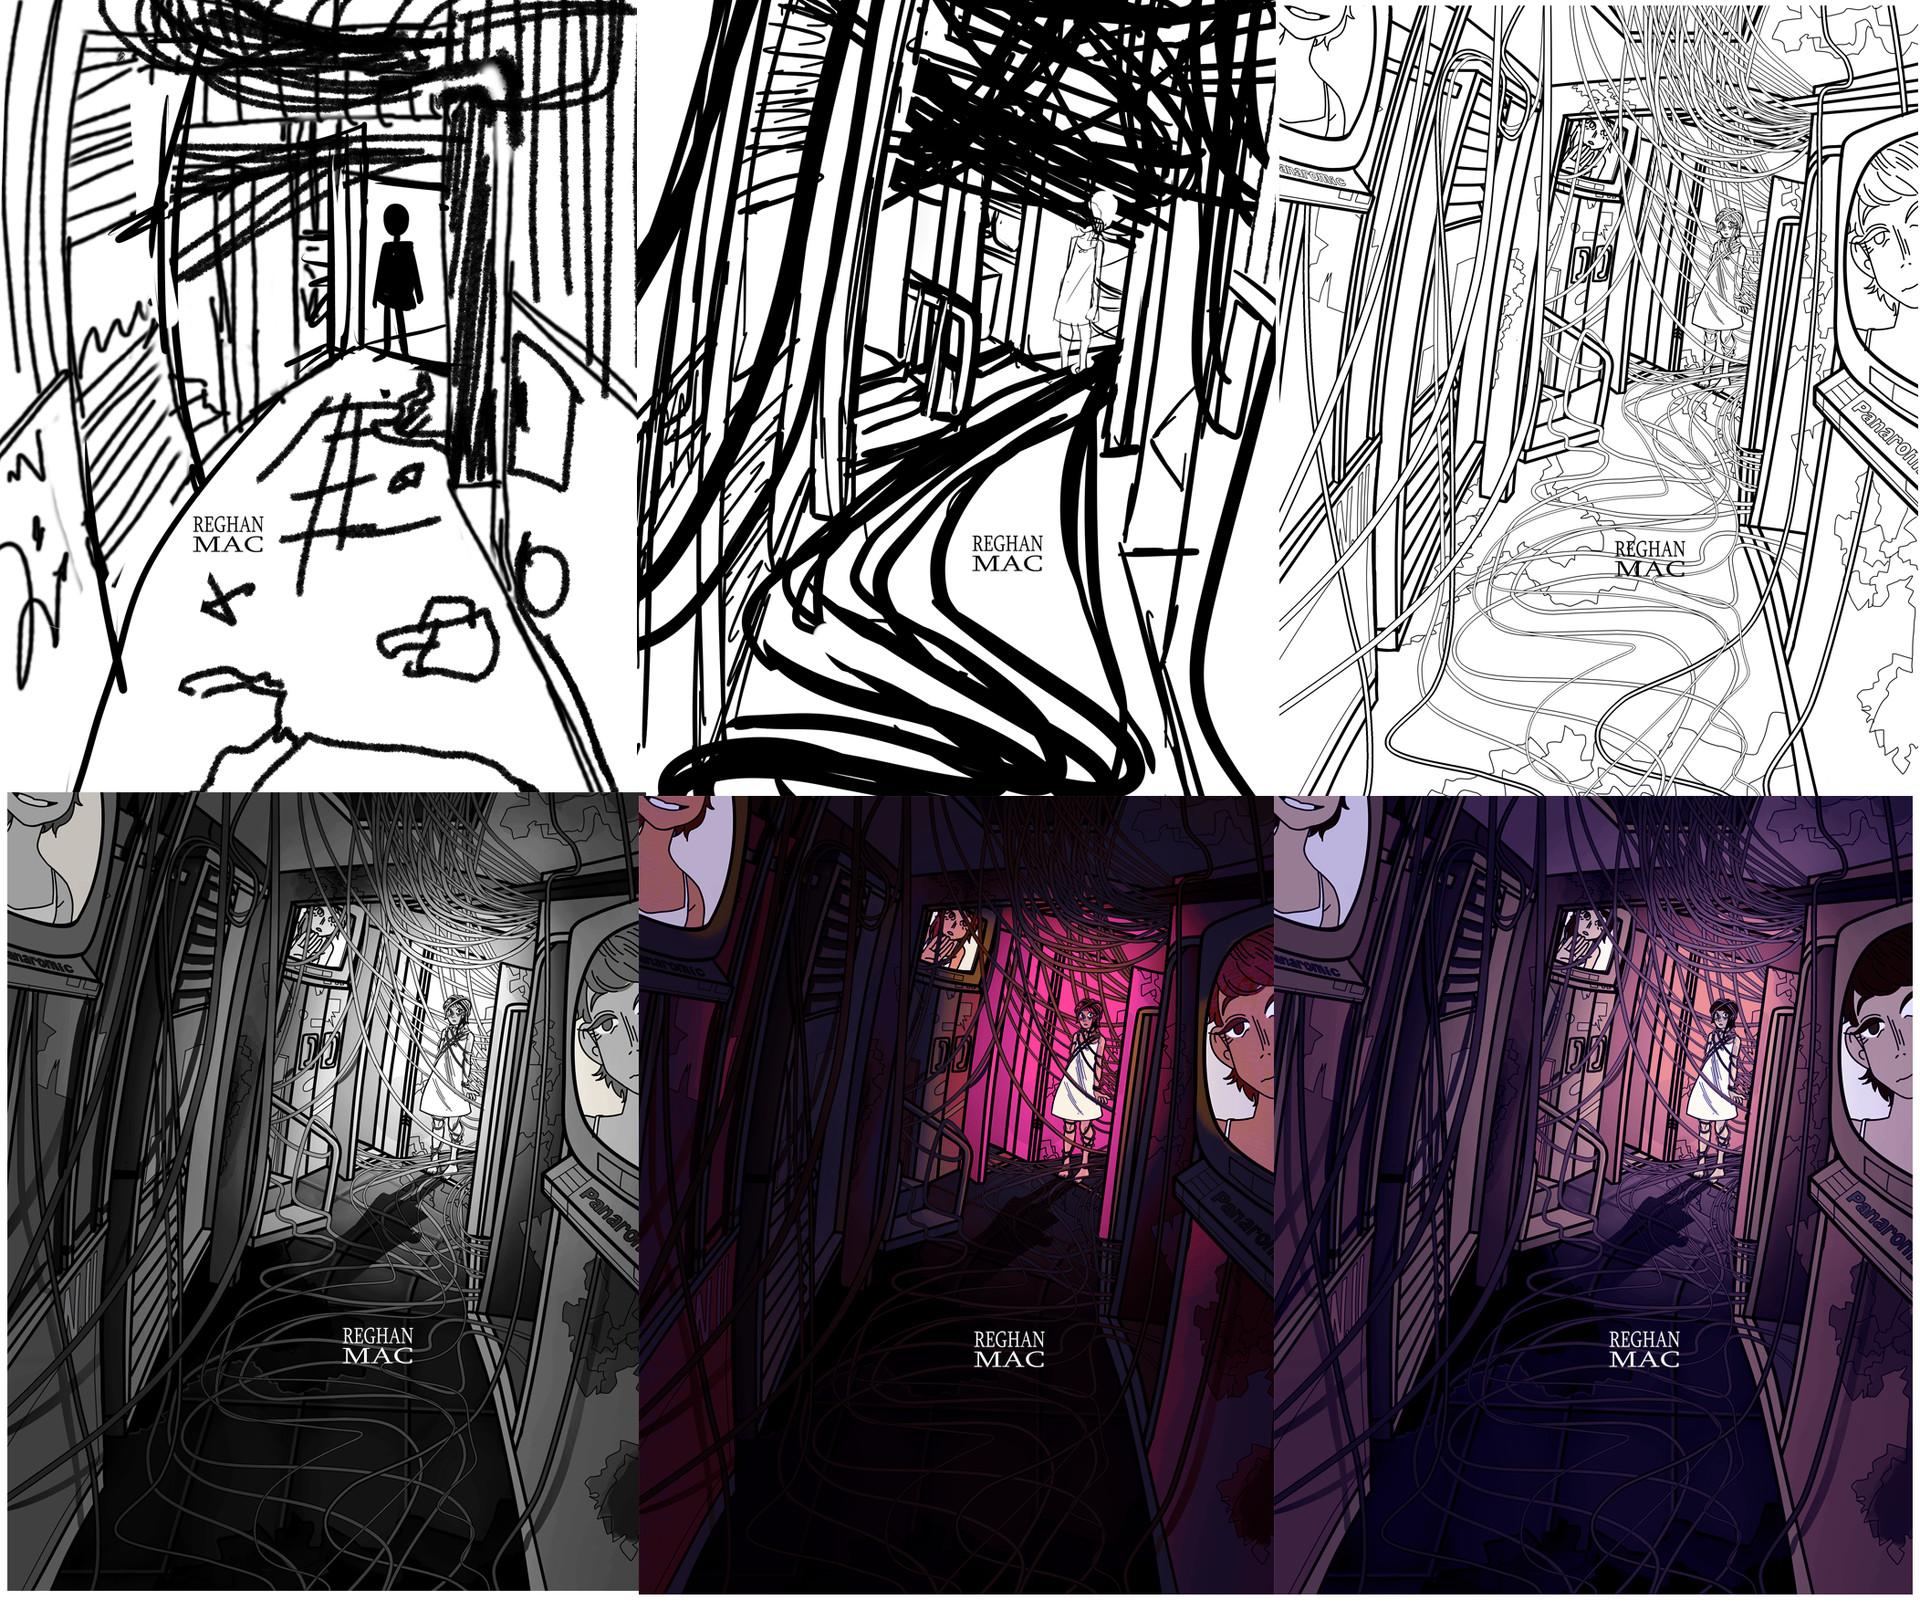 Process. Posted on Instagram (@ReghanMac)